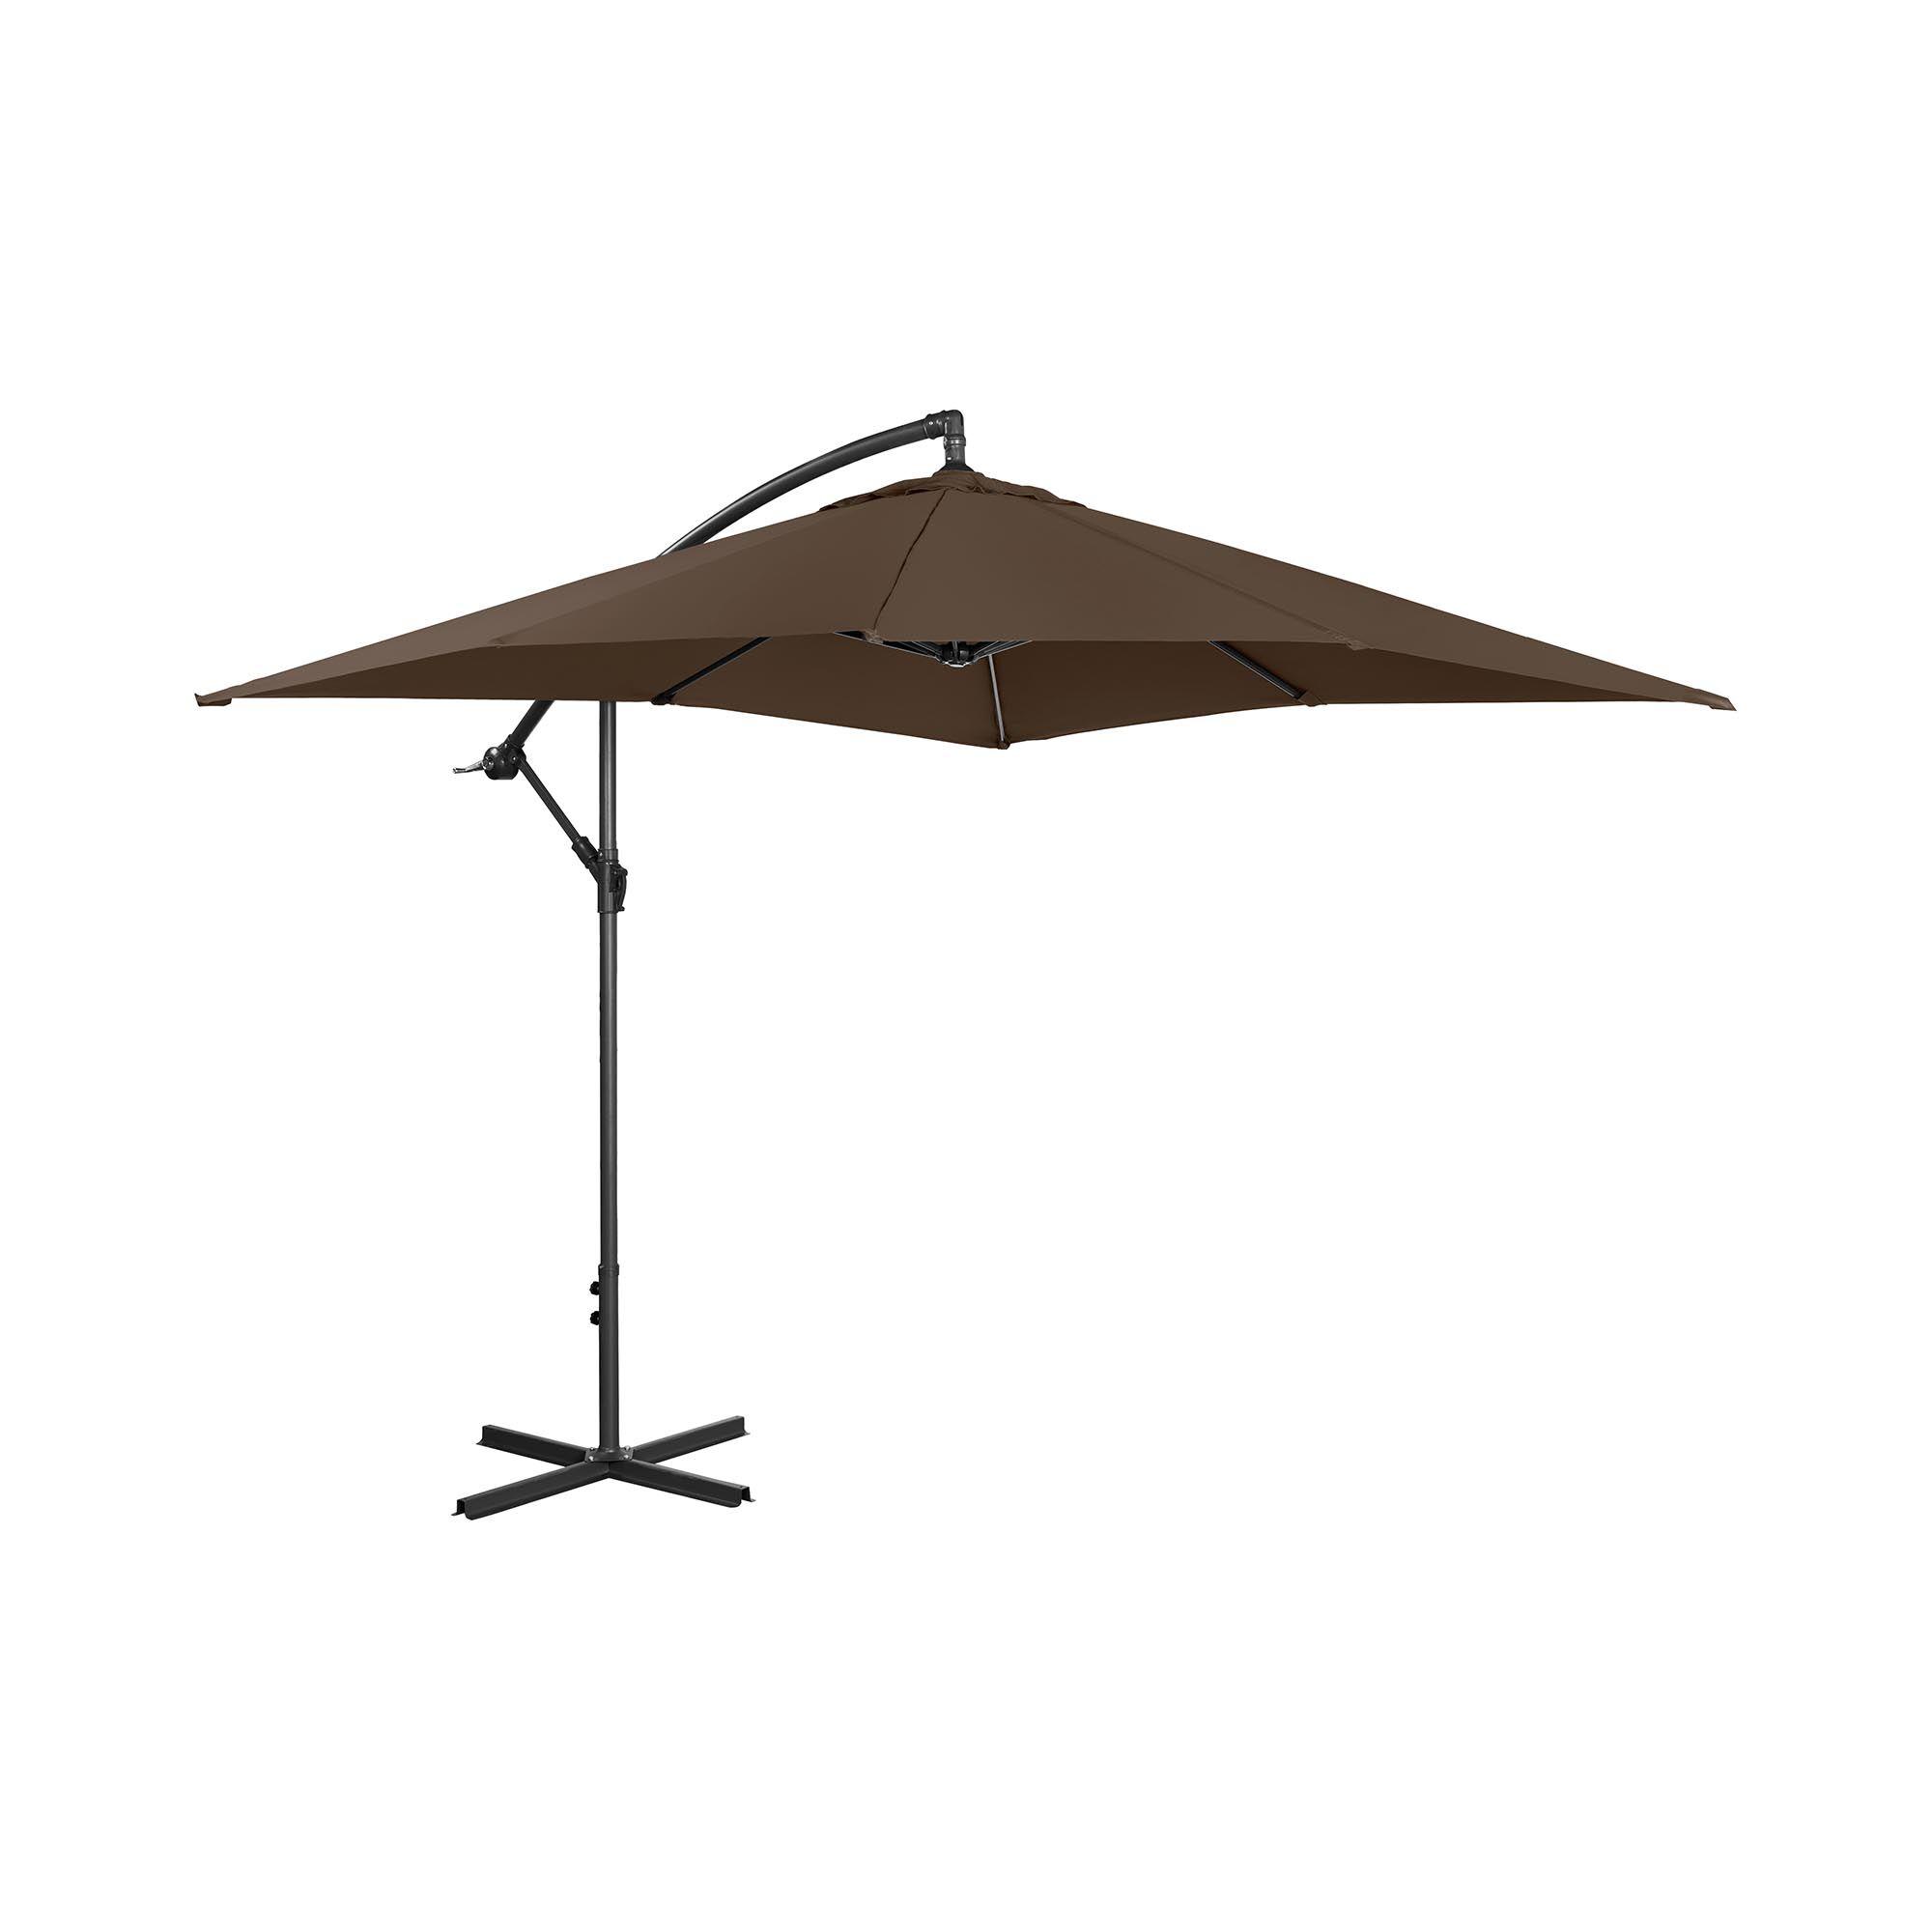 Uniprodo Hængeparasol - brun - rektangulær - 250 x 250 cm - knæk-position UNI_UMBRELLA_SQ250BR